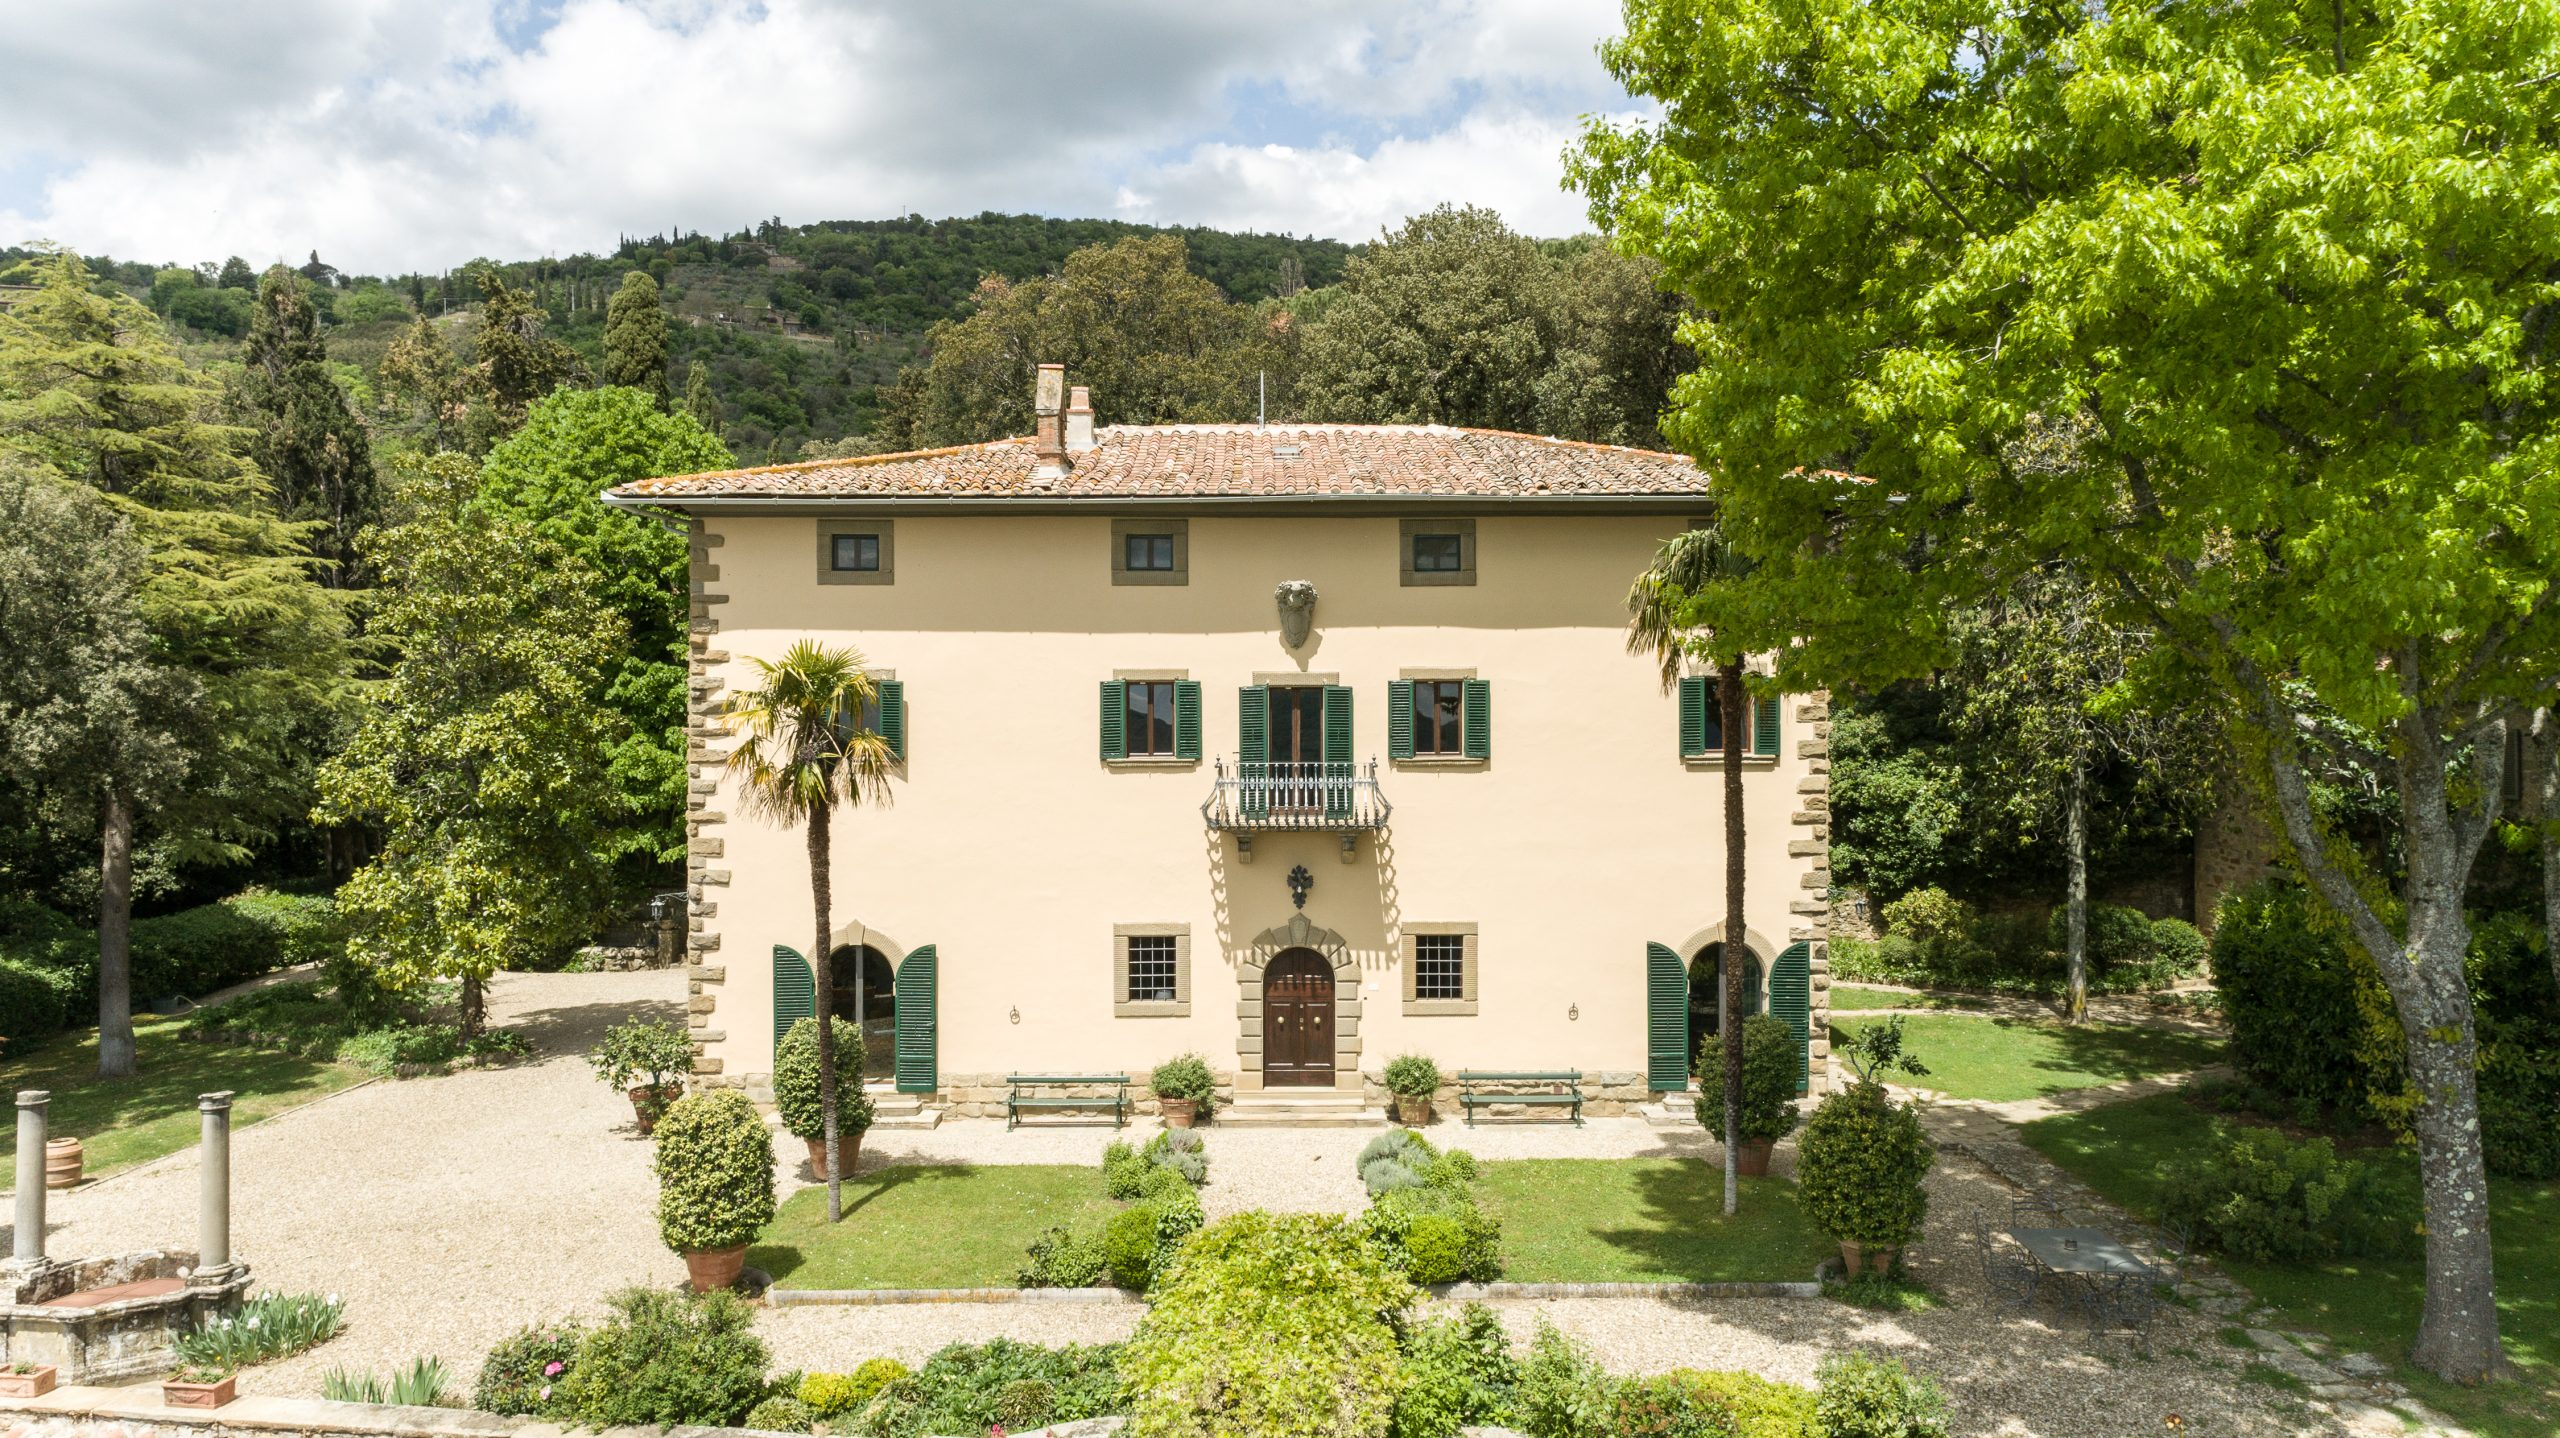 Villa Ugo - Villa Rentals in Tuscany